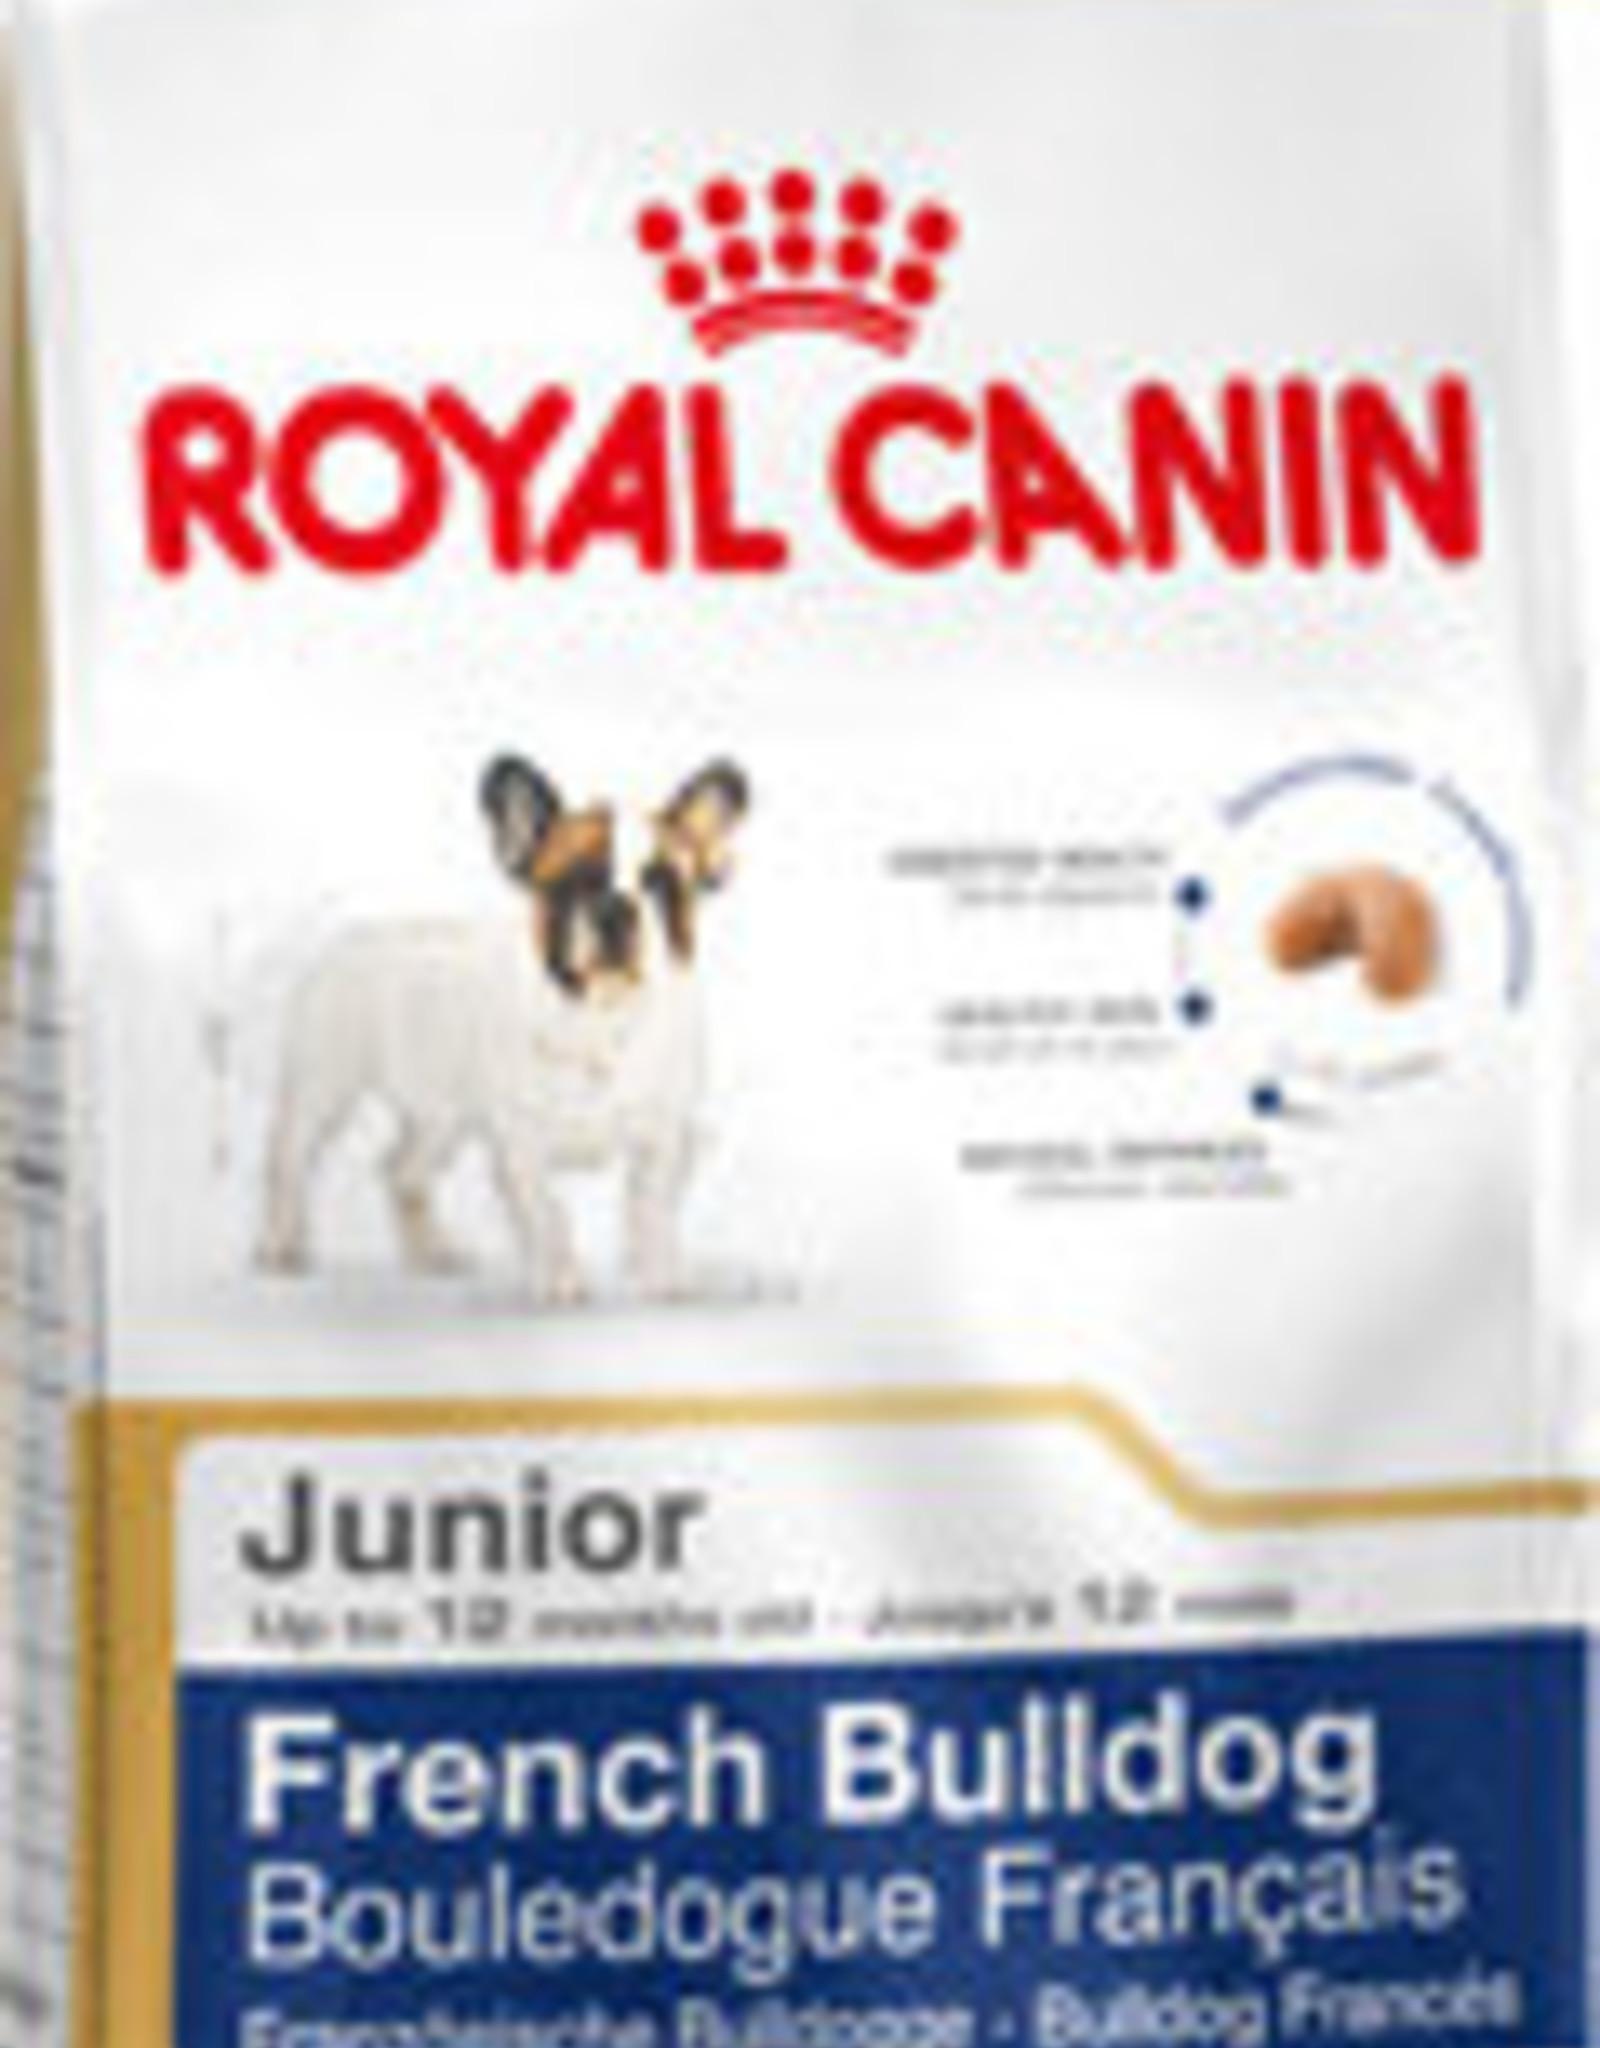 Royal Canin Royal Canin Bhn Bulldog French Junior 10kg